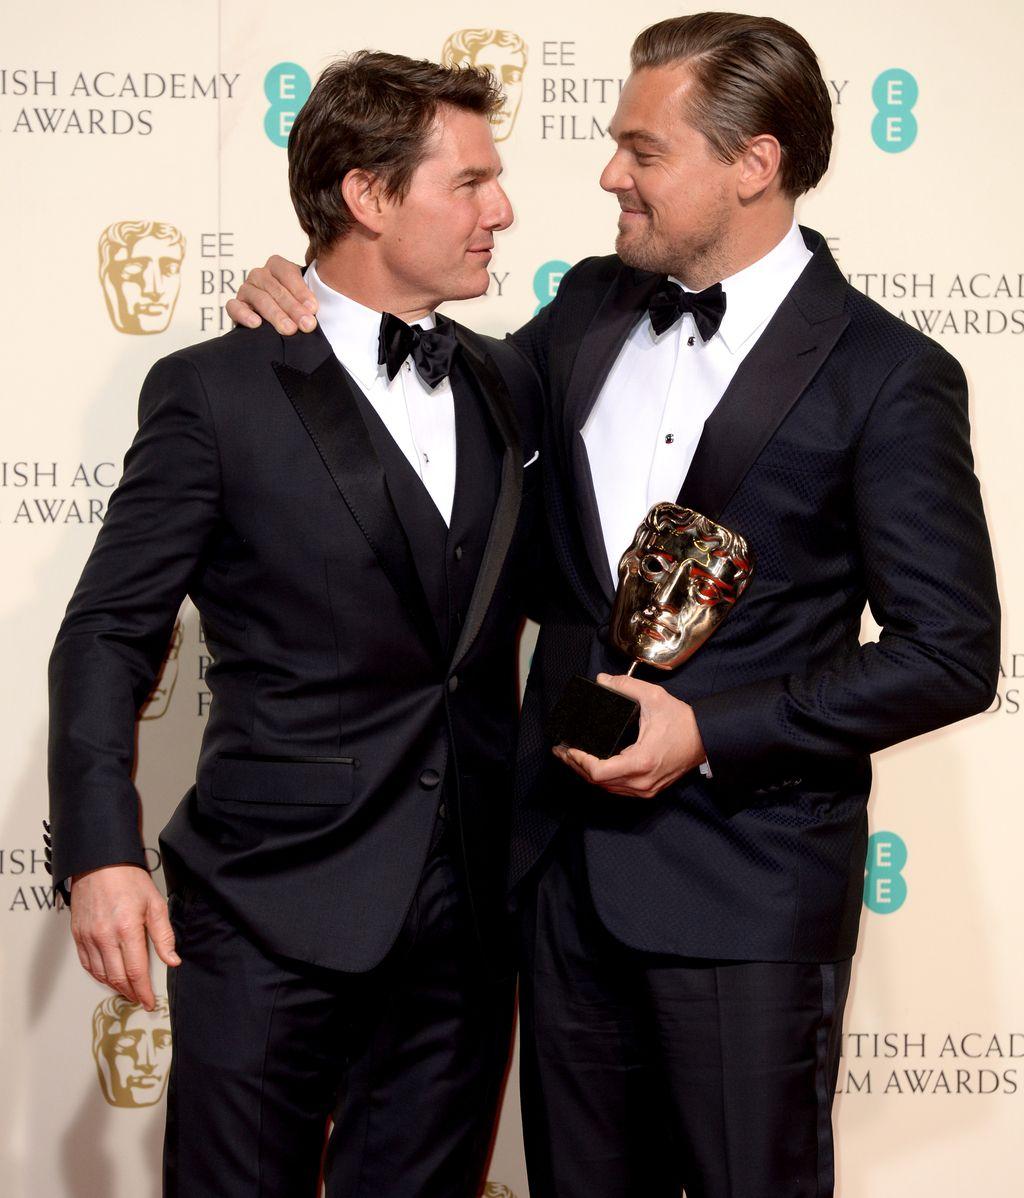 Tom Cruise y leonardo DiCaprio